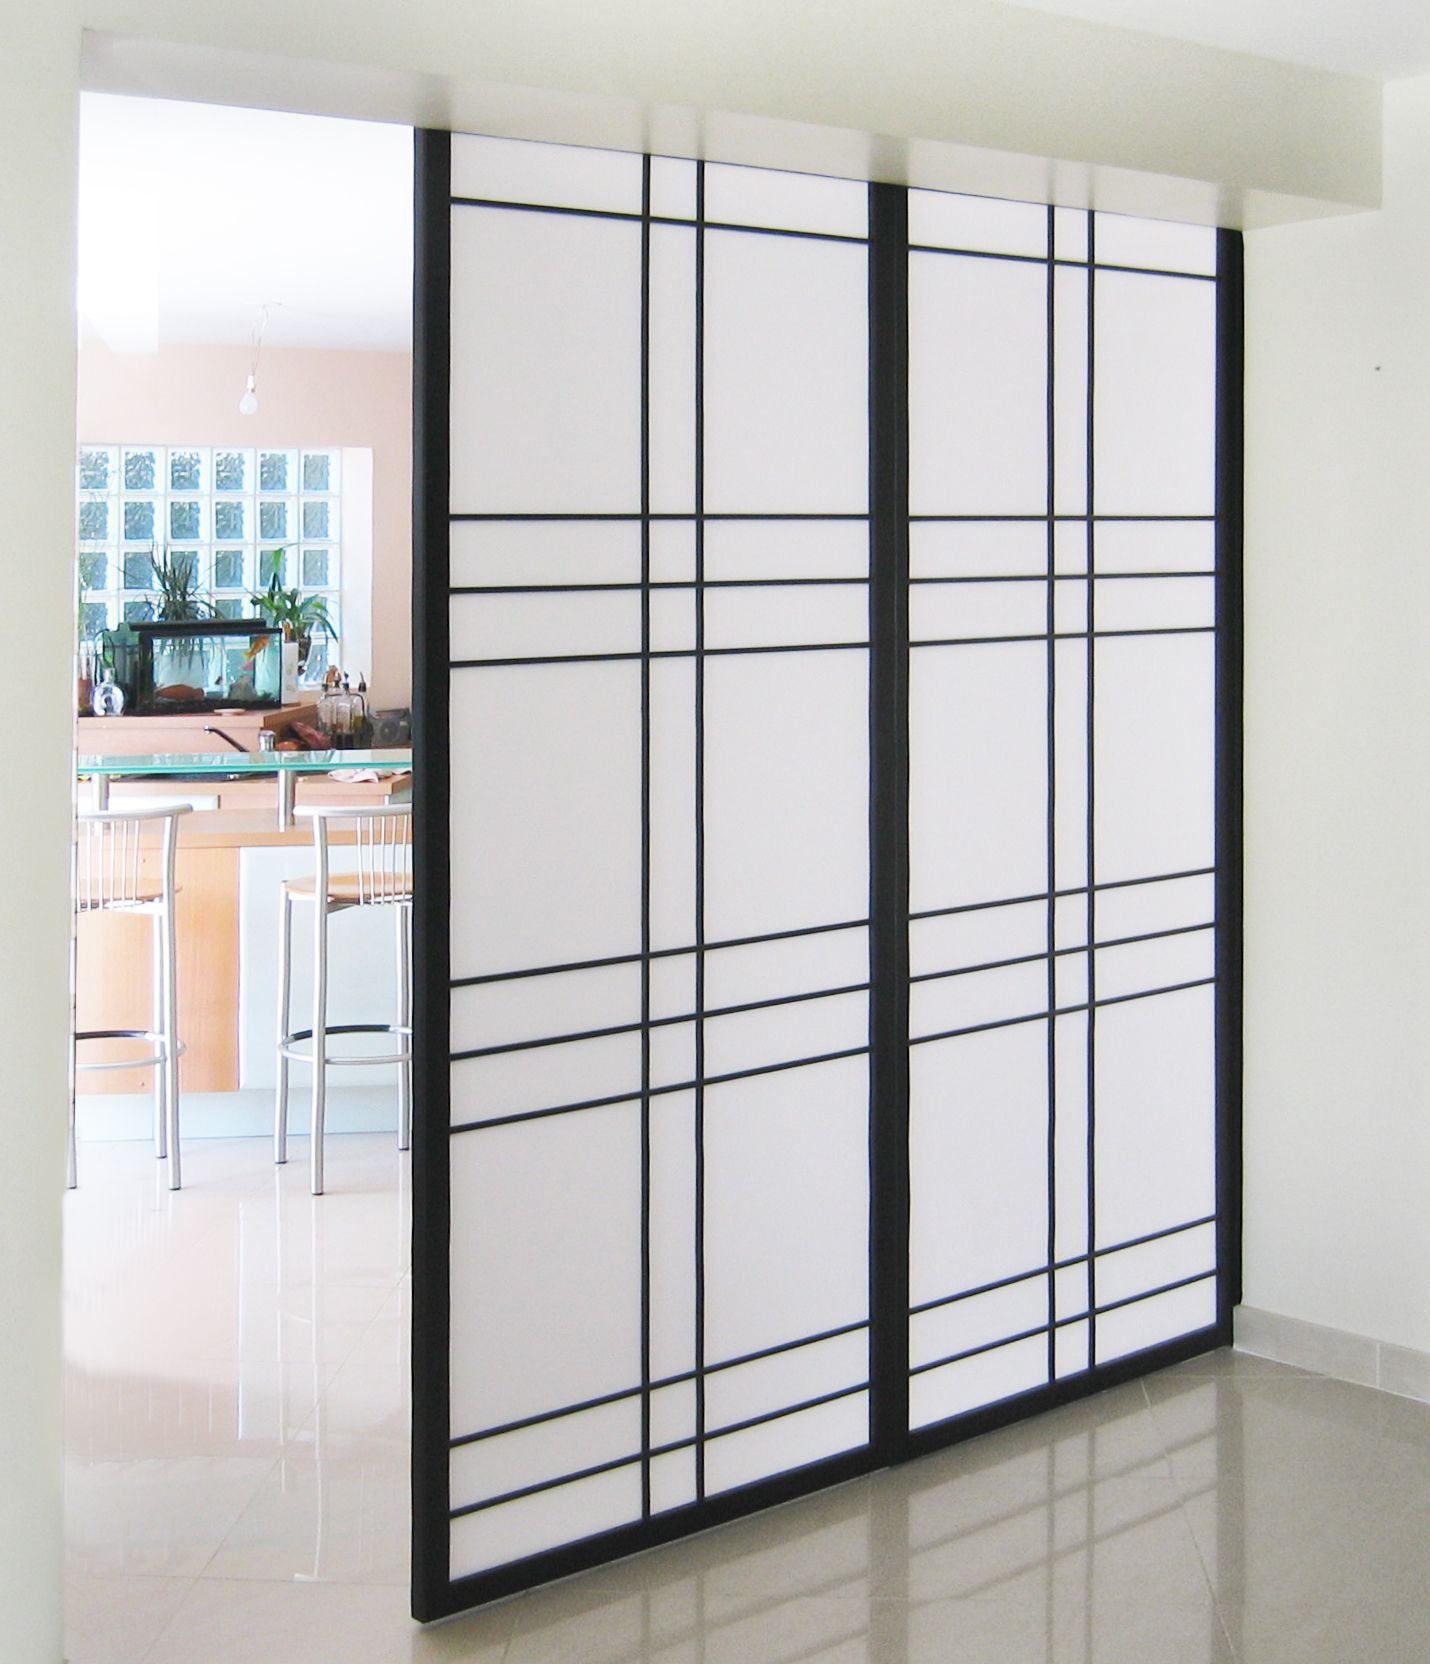 cloison japonaise coulissante shoji akita. Black Bedroom Furniture Sets. Home Design Ideas